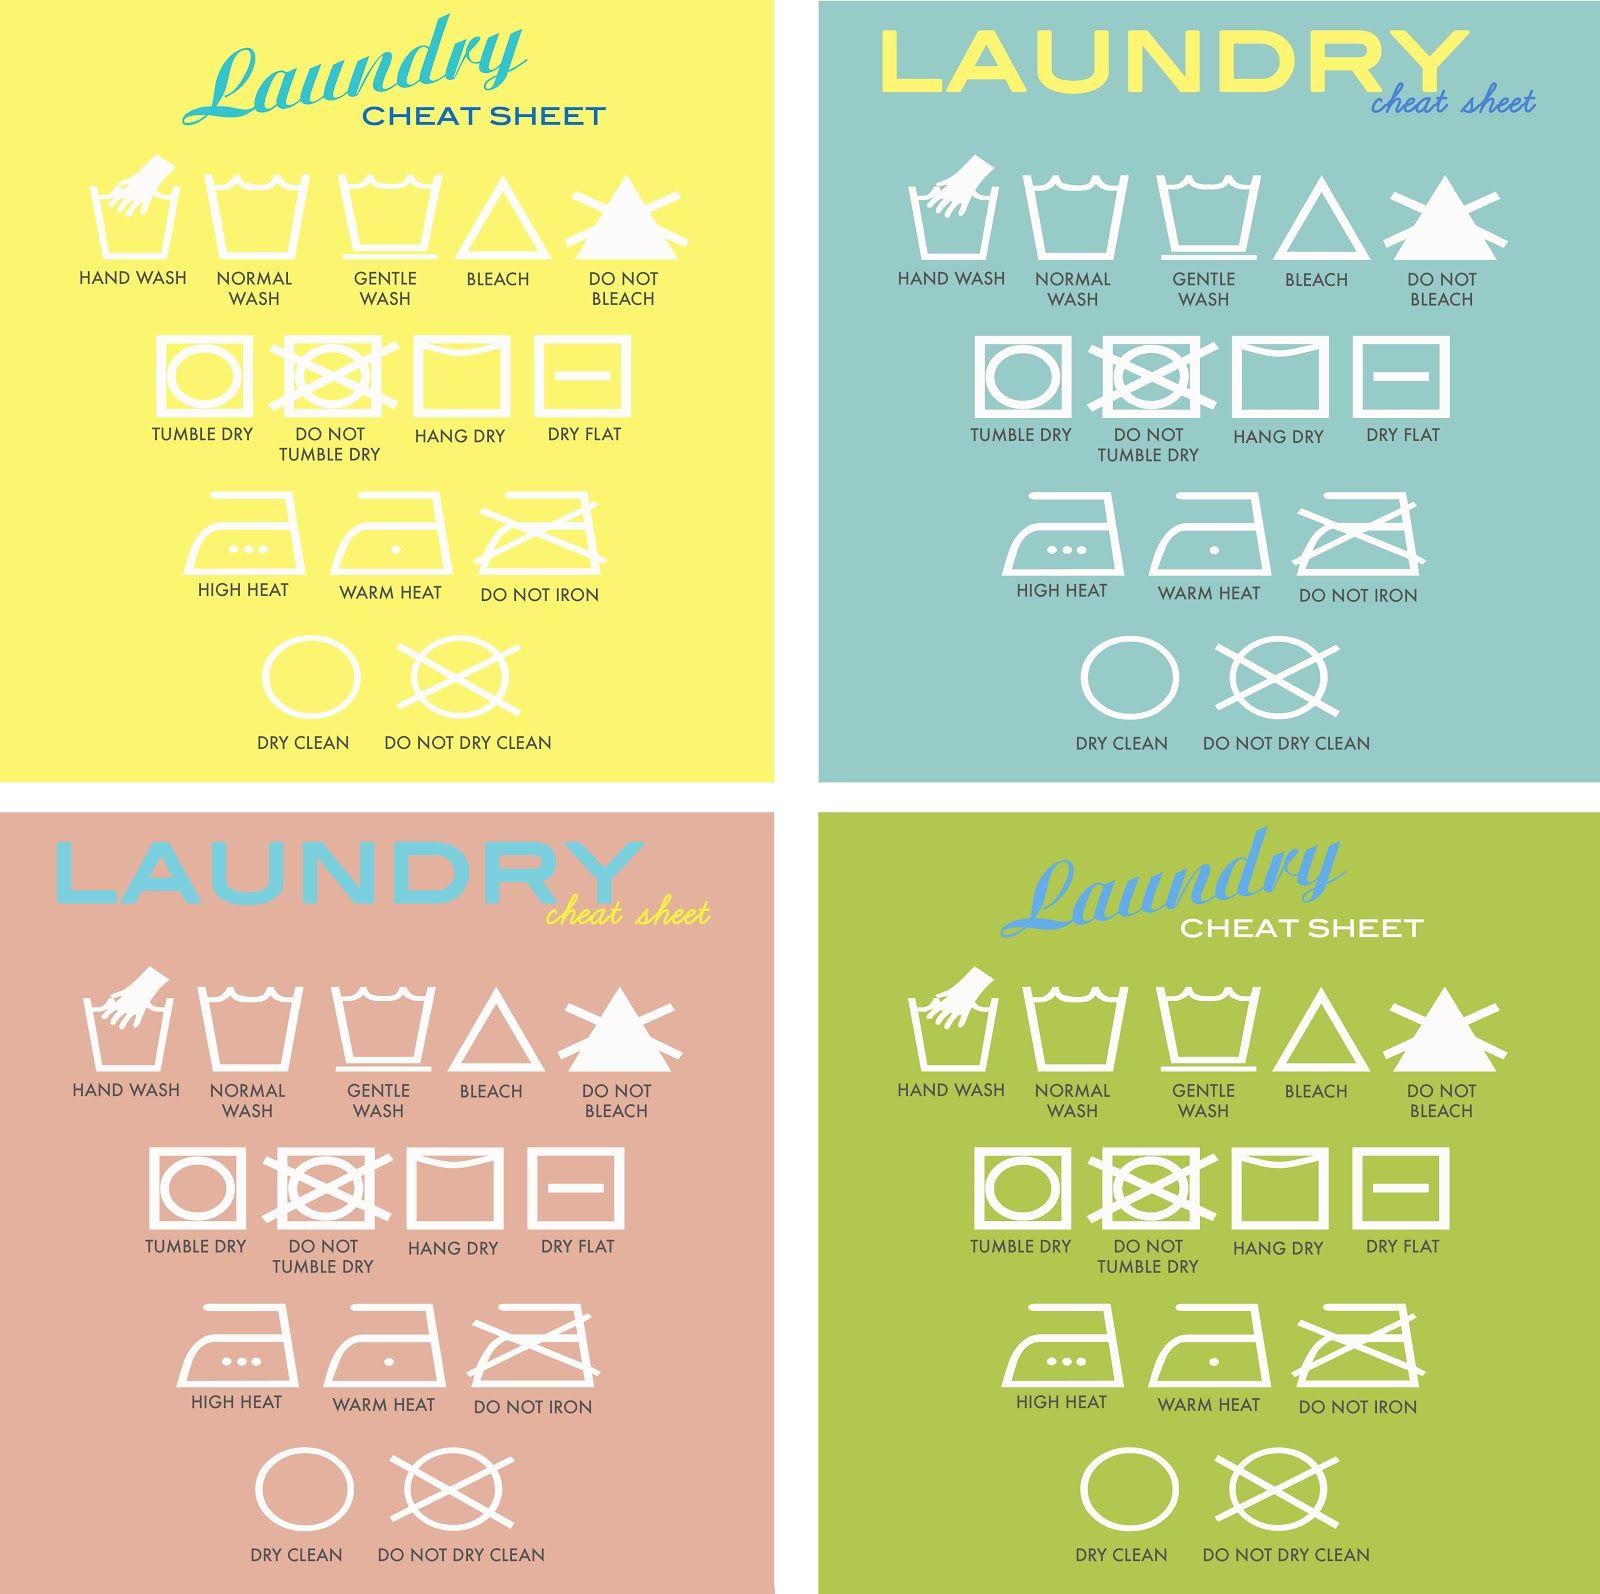 Laundry Symbols Art Toronto Diy Design And Lifestyle Blog About Renovation